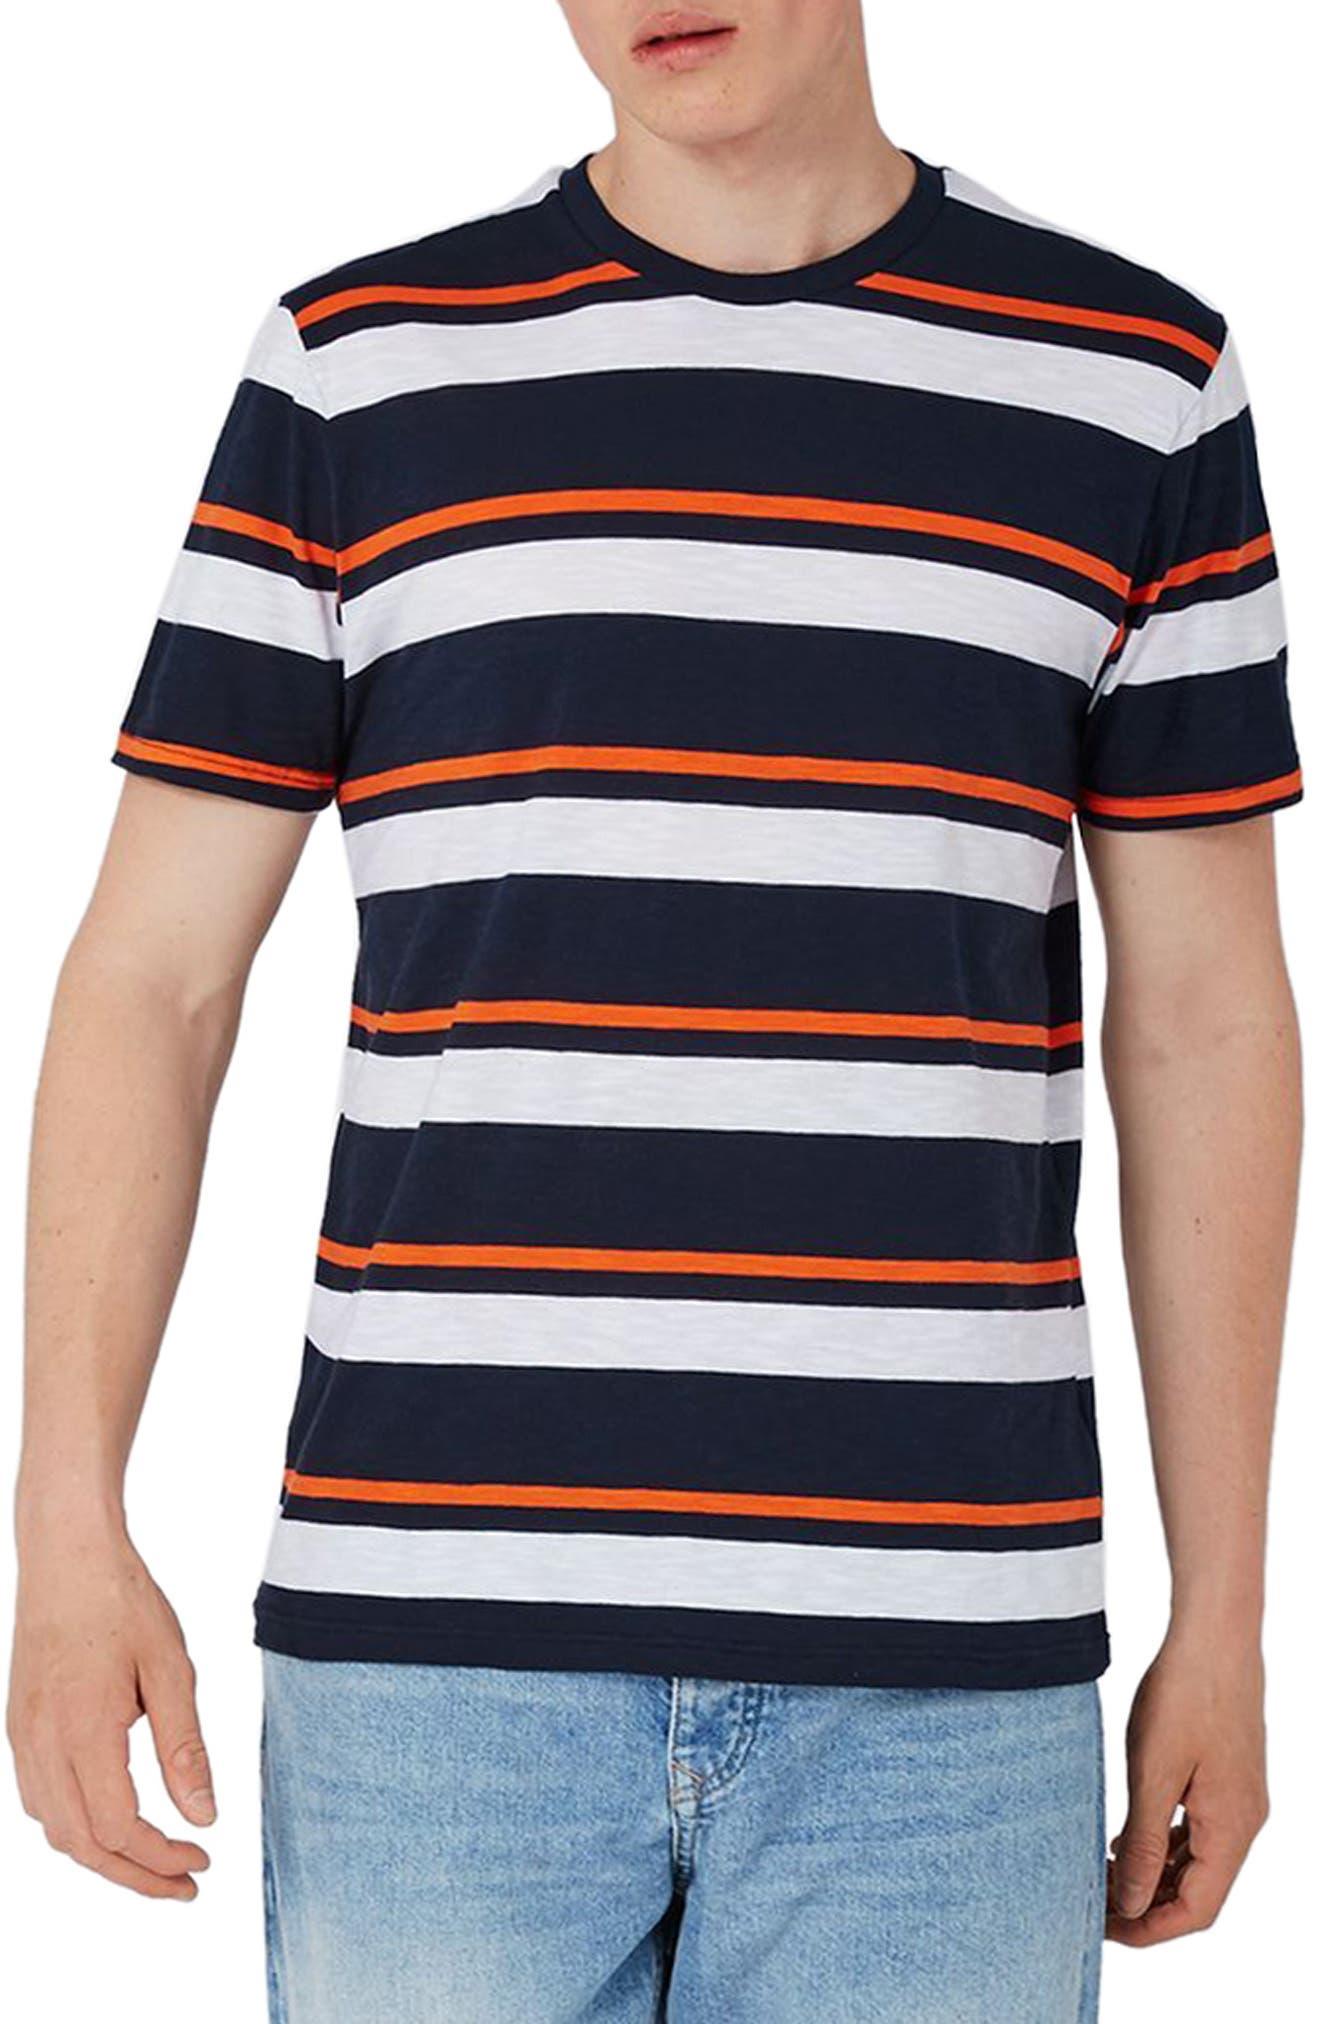 Topman Double Stripe T-Shirt